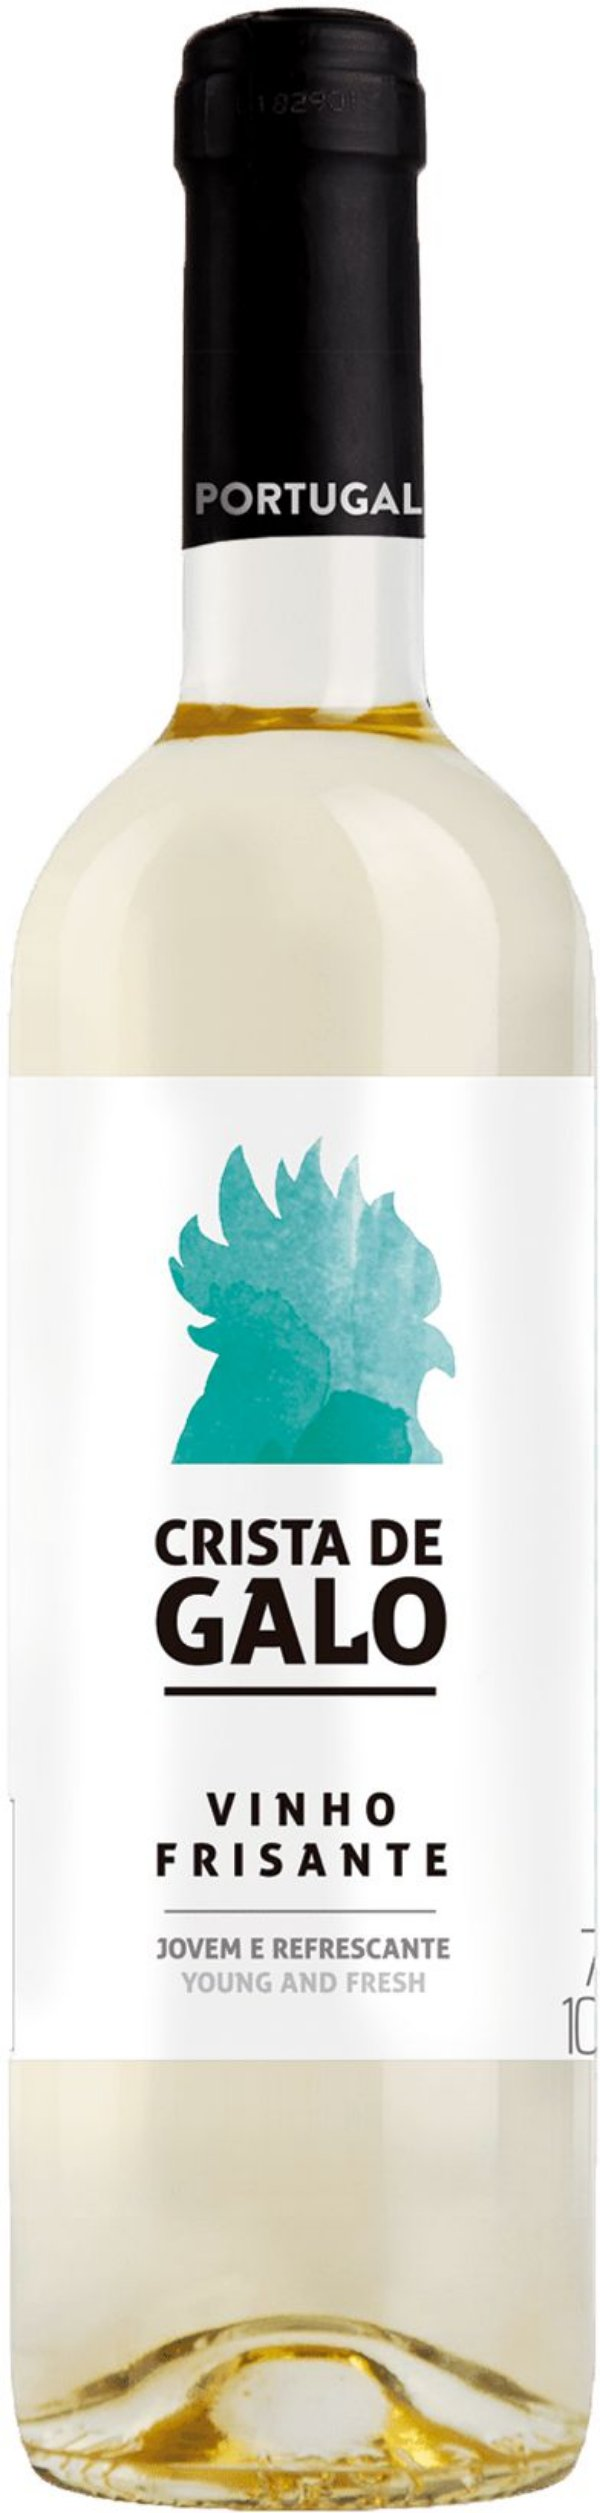 Crista de Galo Frisante Branco- 750 ml